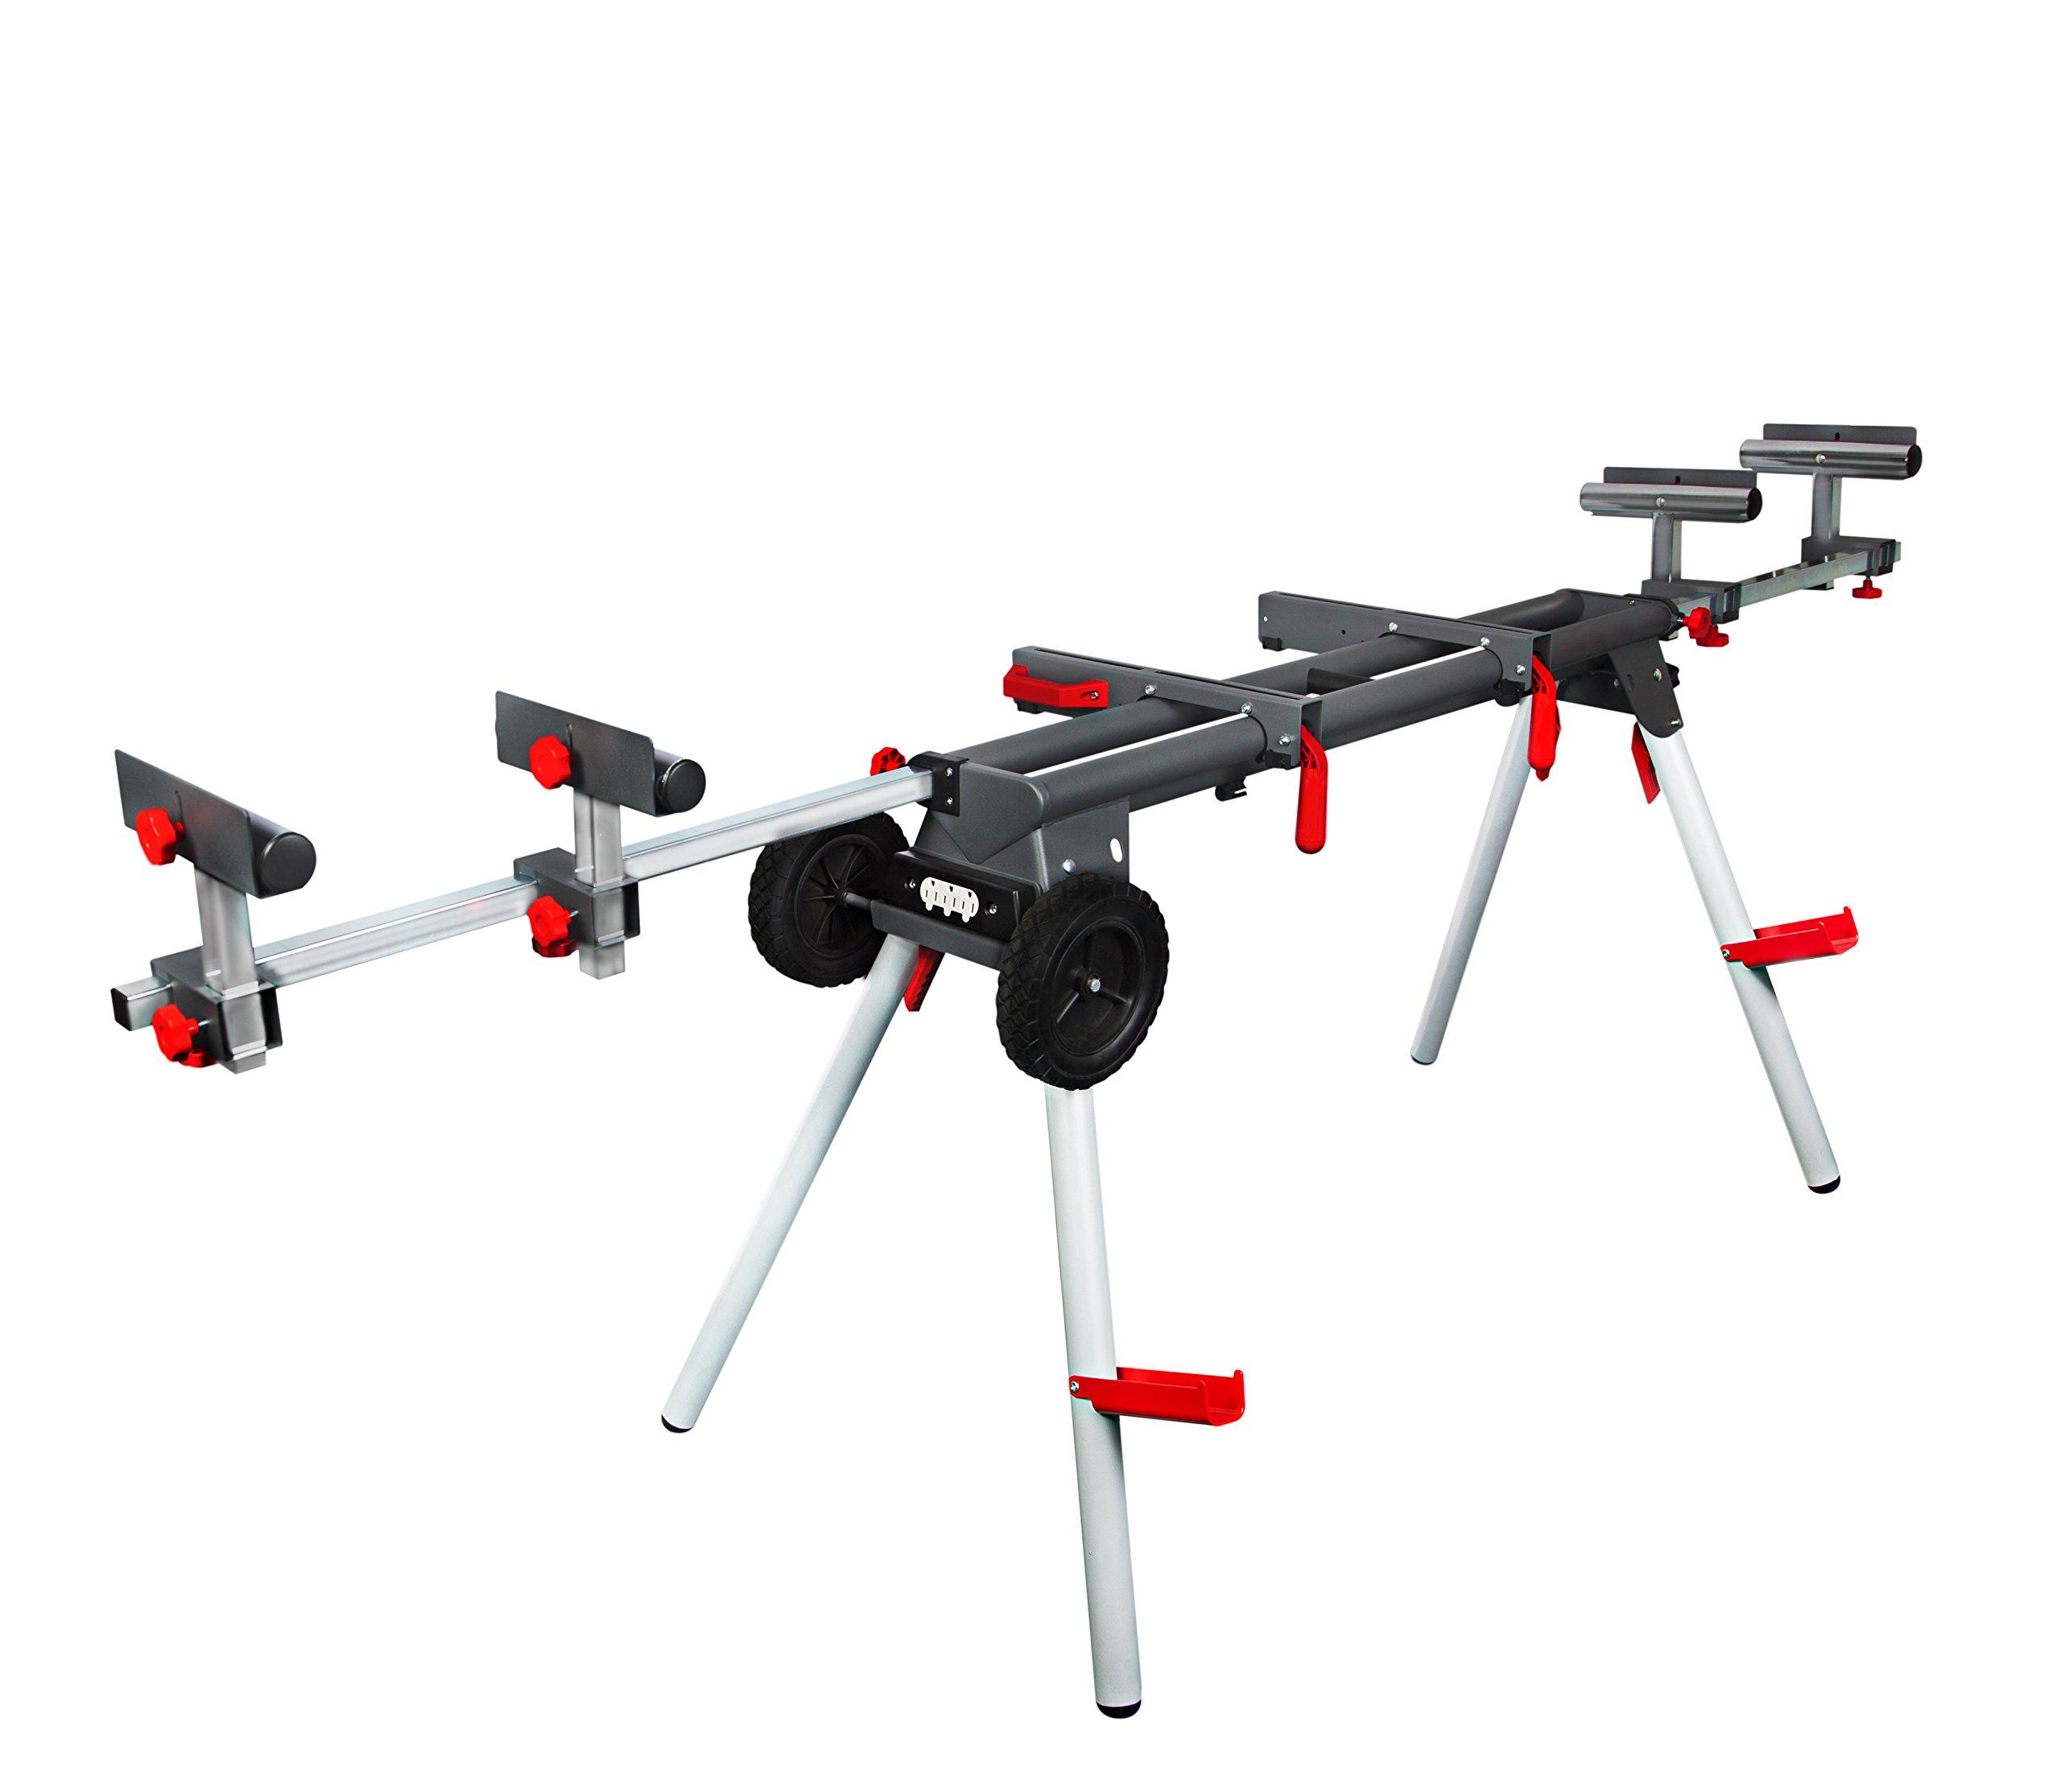 PROTOCOL Equipment WS-124 Professional Miter Saw Workstation